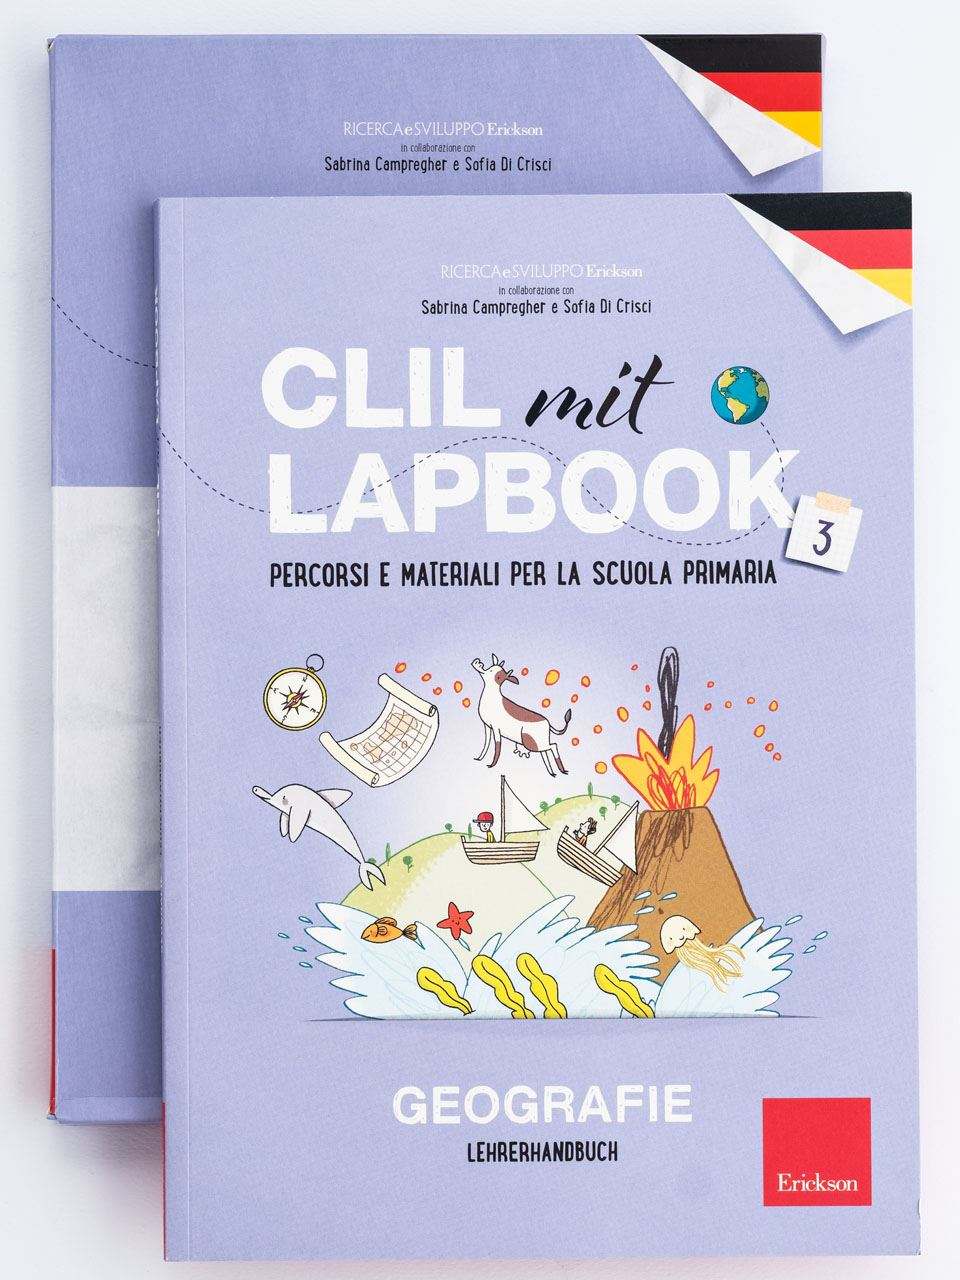 CLIL mit LAPBOOK - Geografie - Classe terza - Libri - Erickson 2